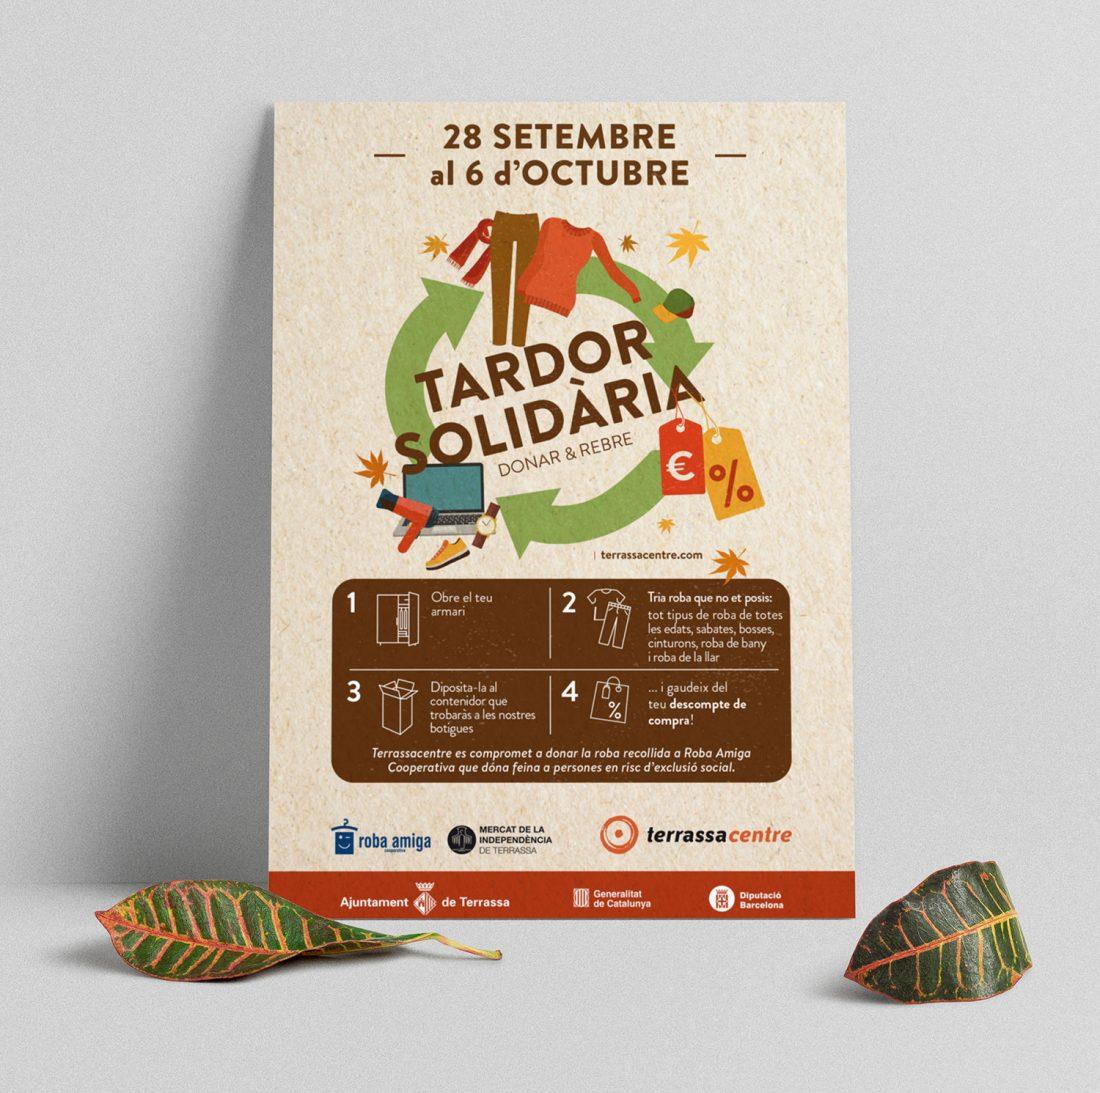 Tardor Solidaria Terrassa Centre